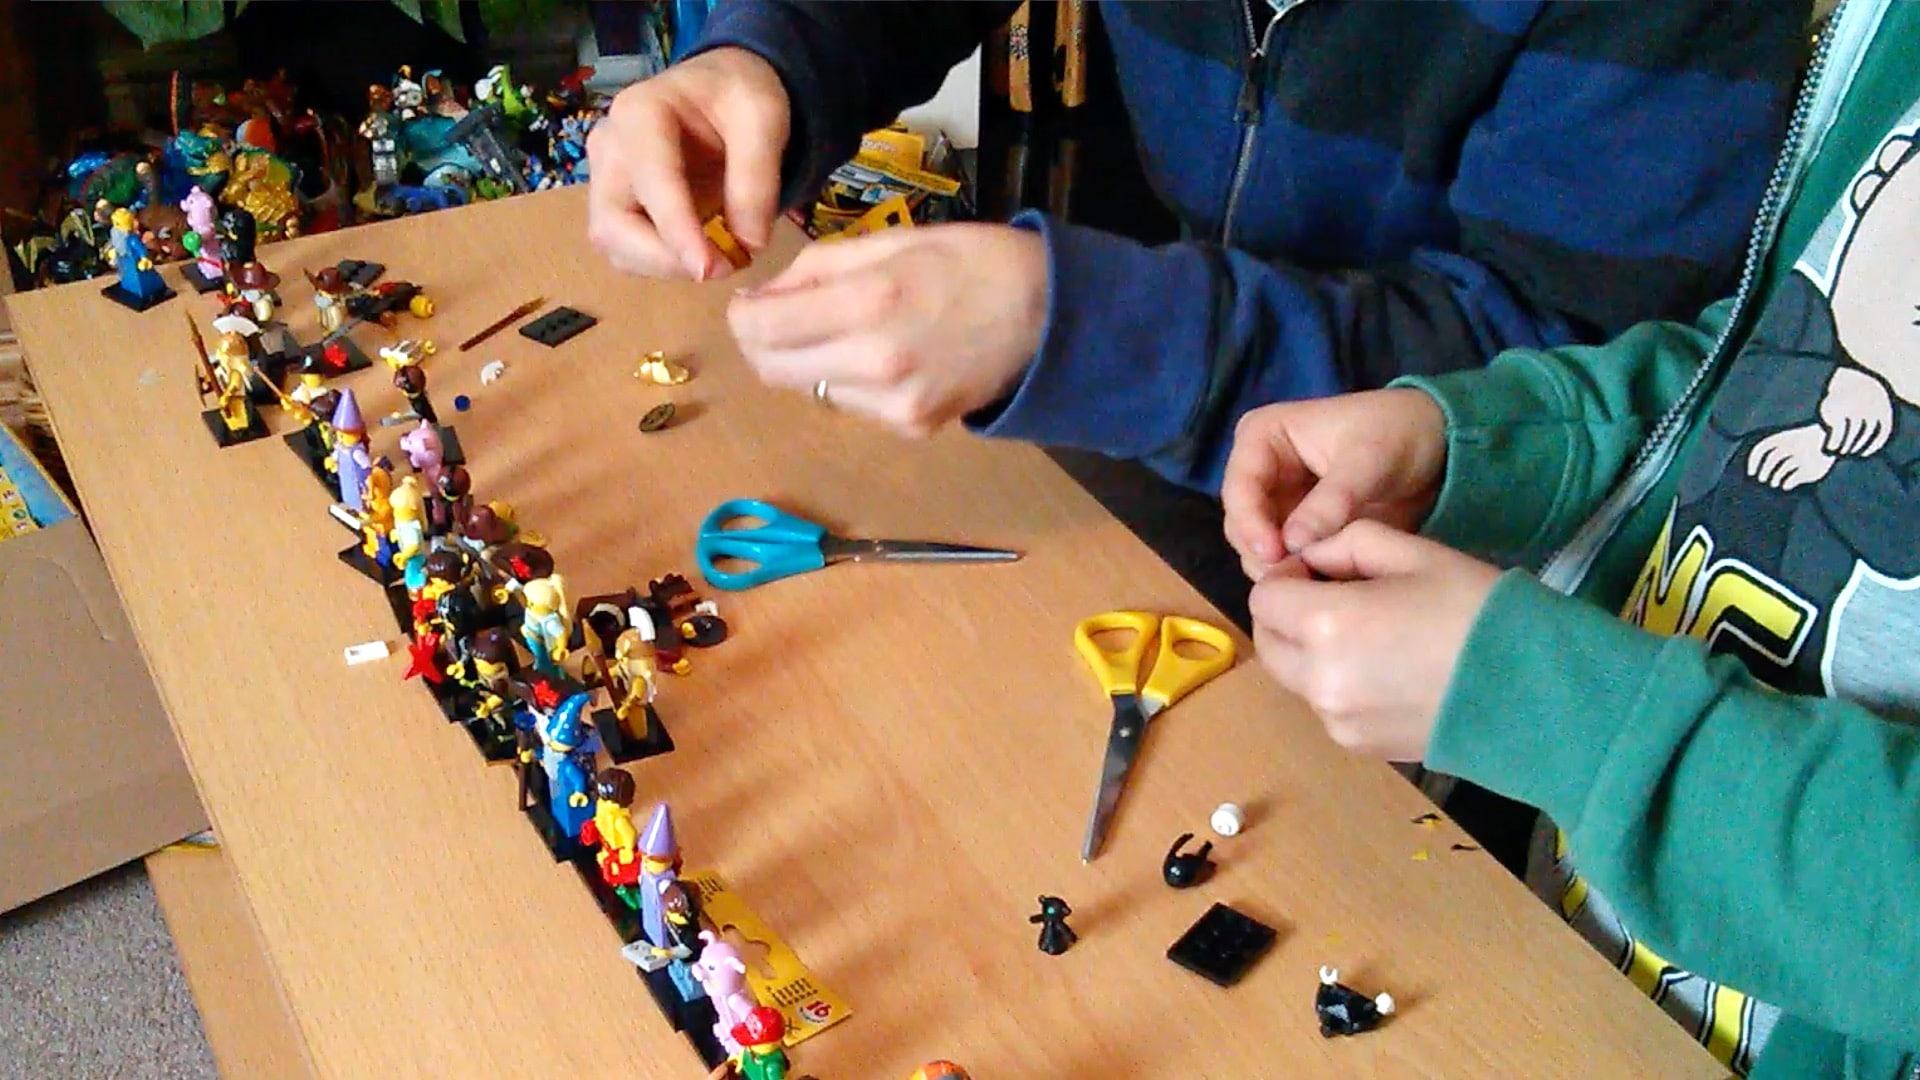 FamilyGamerTV LEGO Minifigures